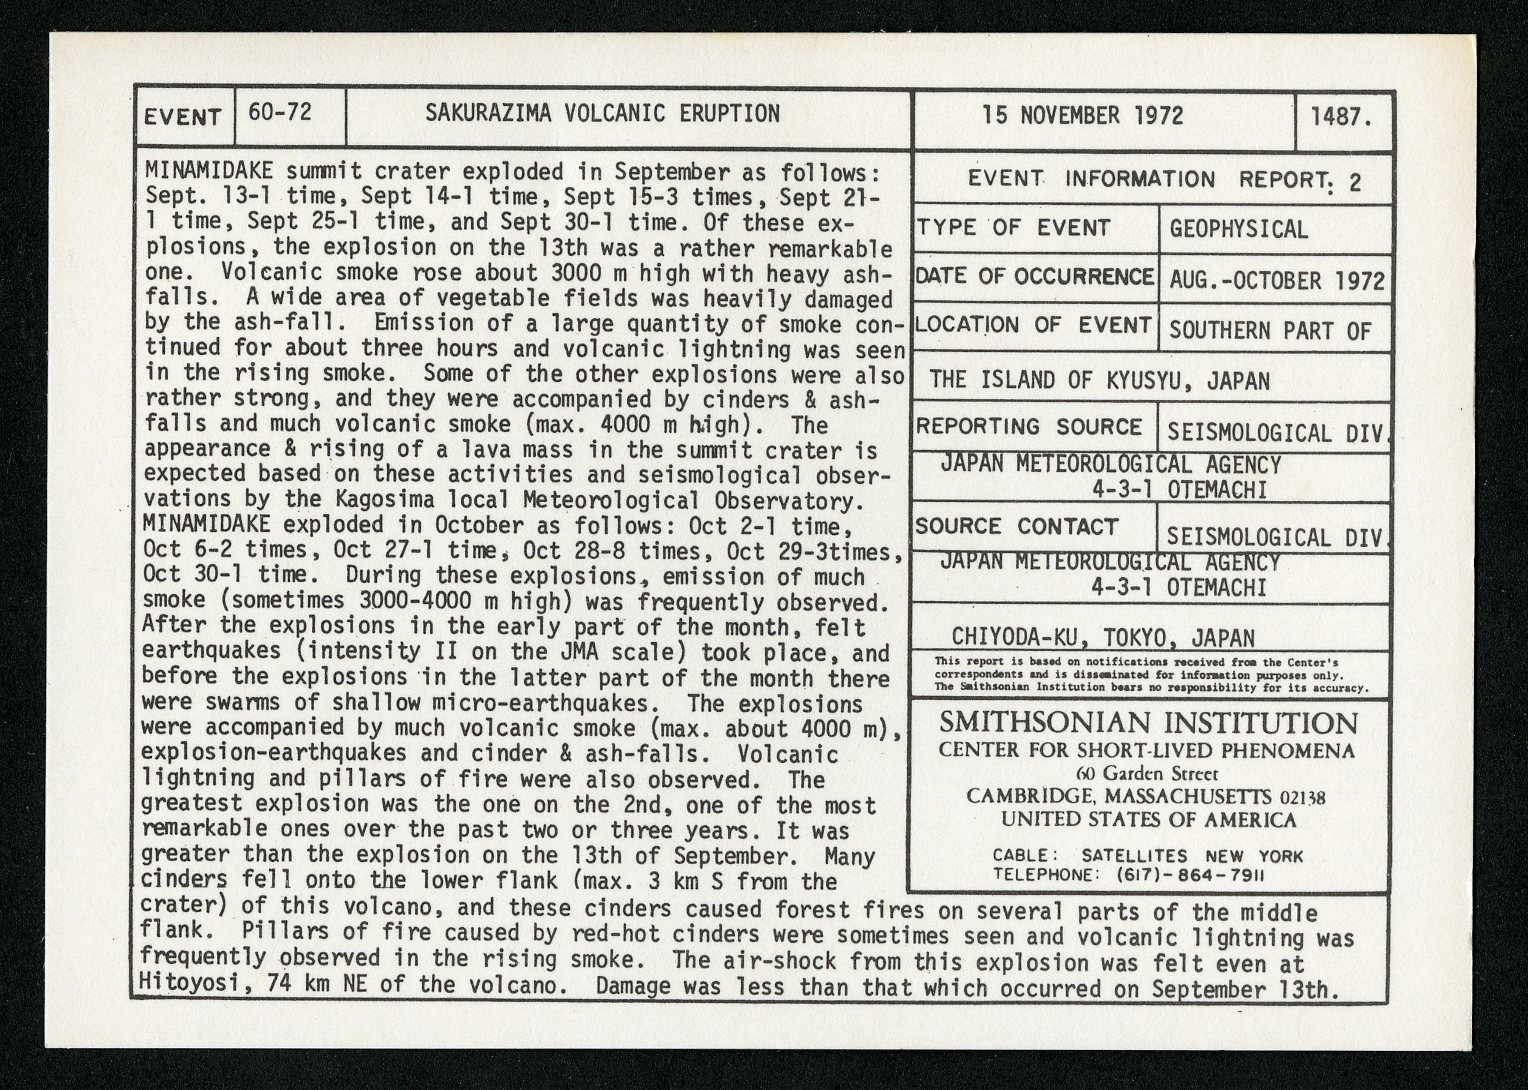 Event card - Sakurazima Volcanic Eruption, November 15, 1972